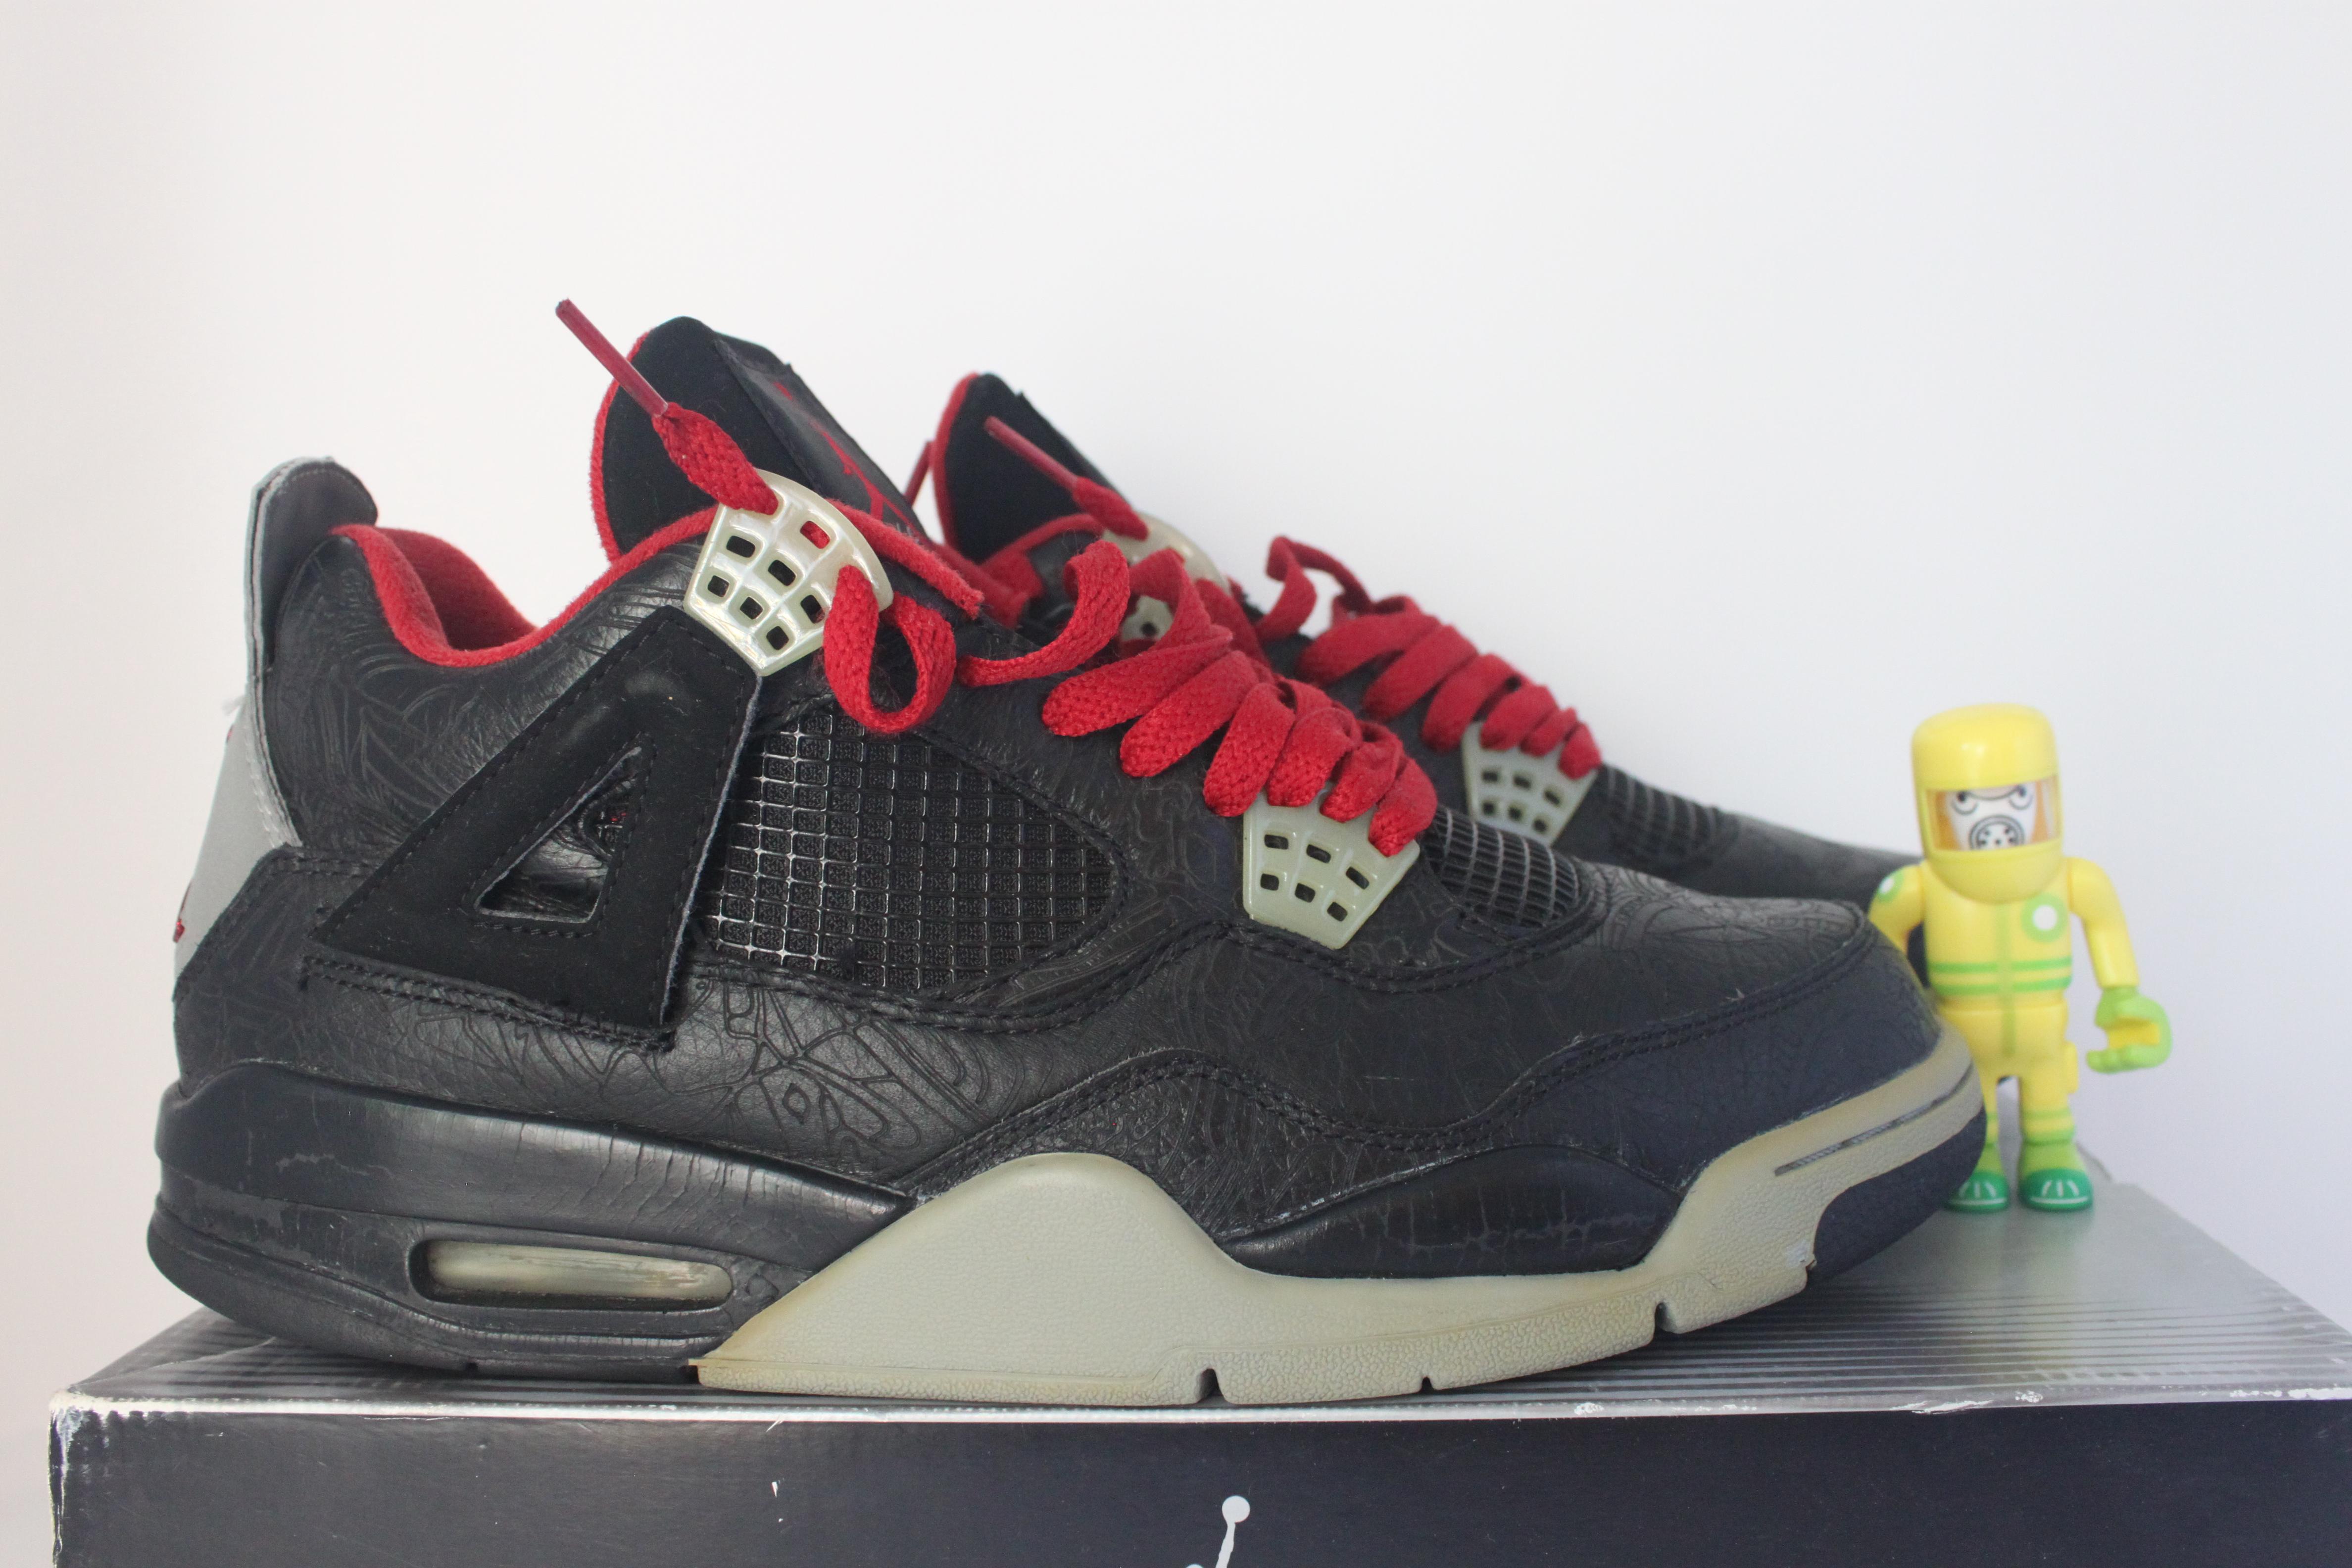 20a2e9d9ec3925 Jordan Brand. Air Jordan 4 Retro Laser Black SZ 10.5 rare iv fire red bred  312255-061